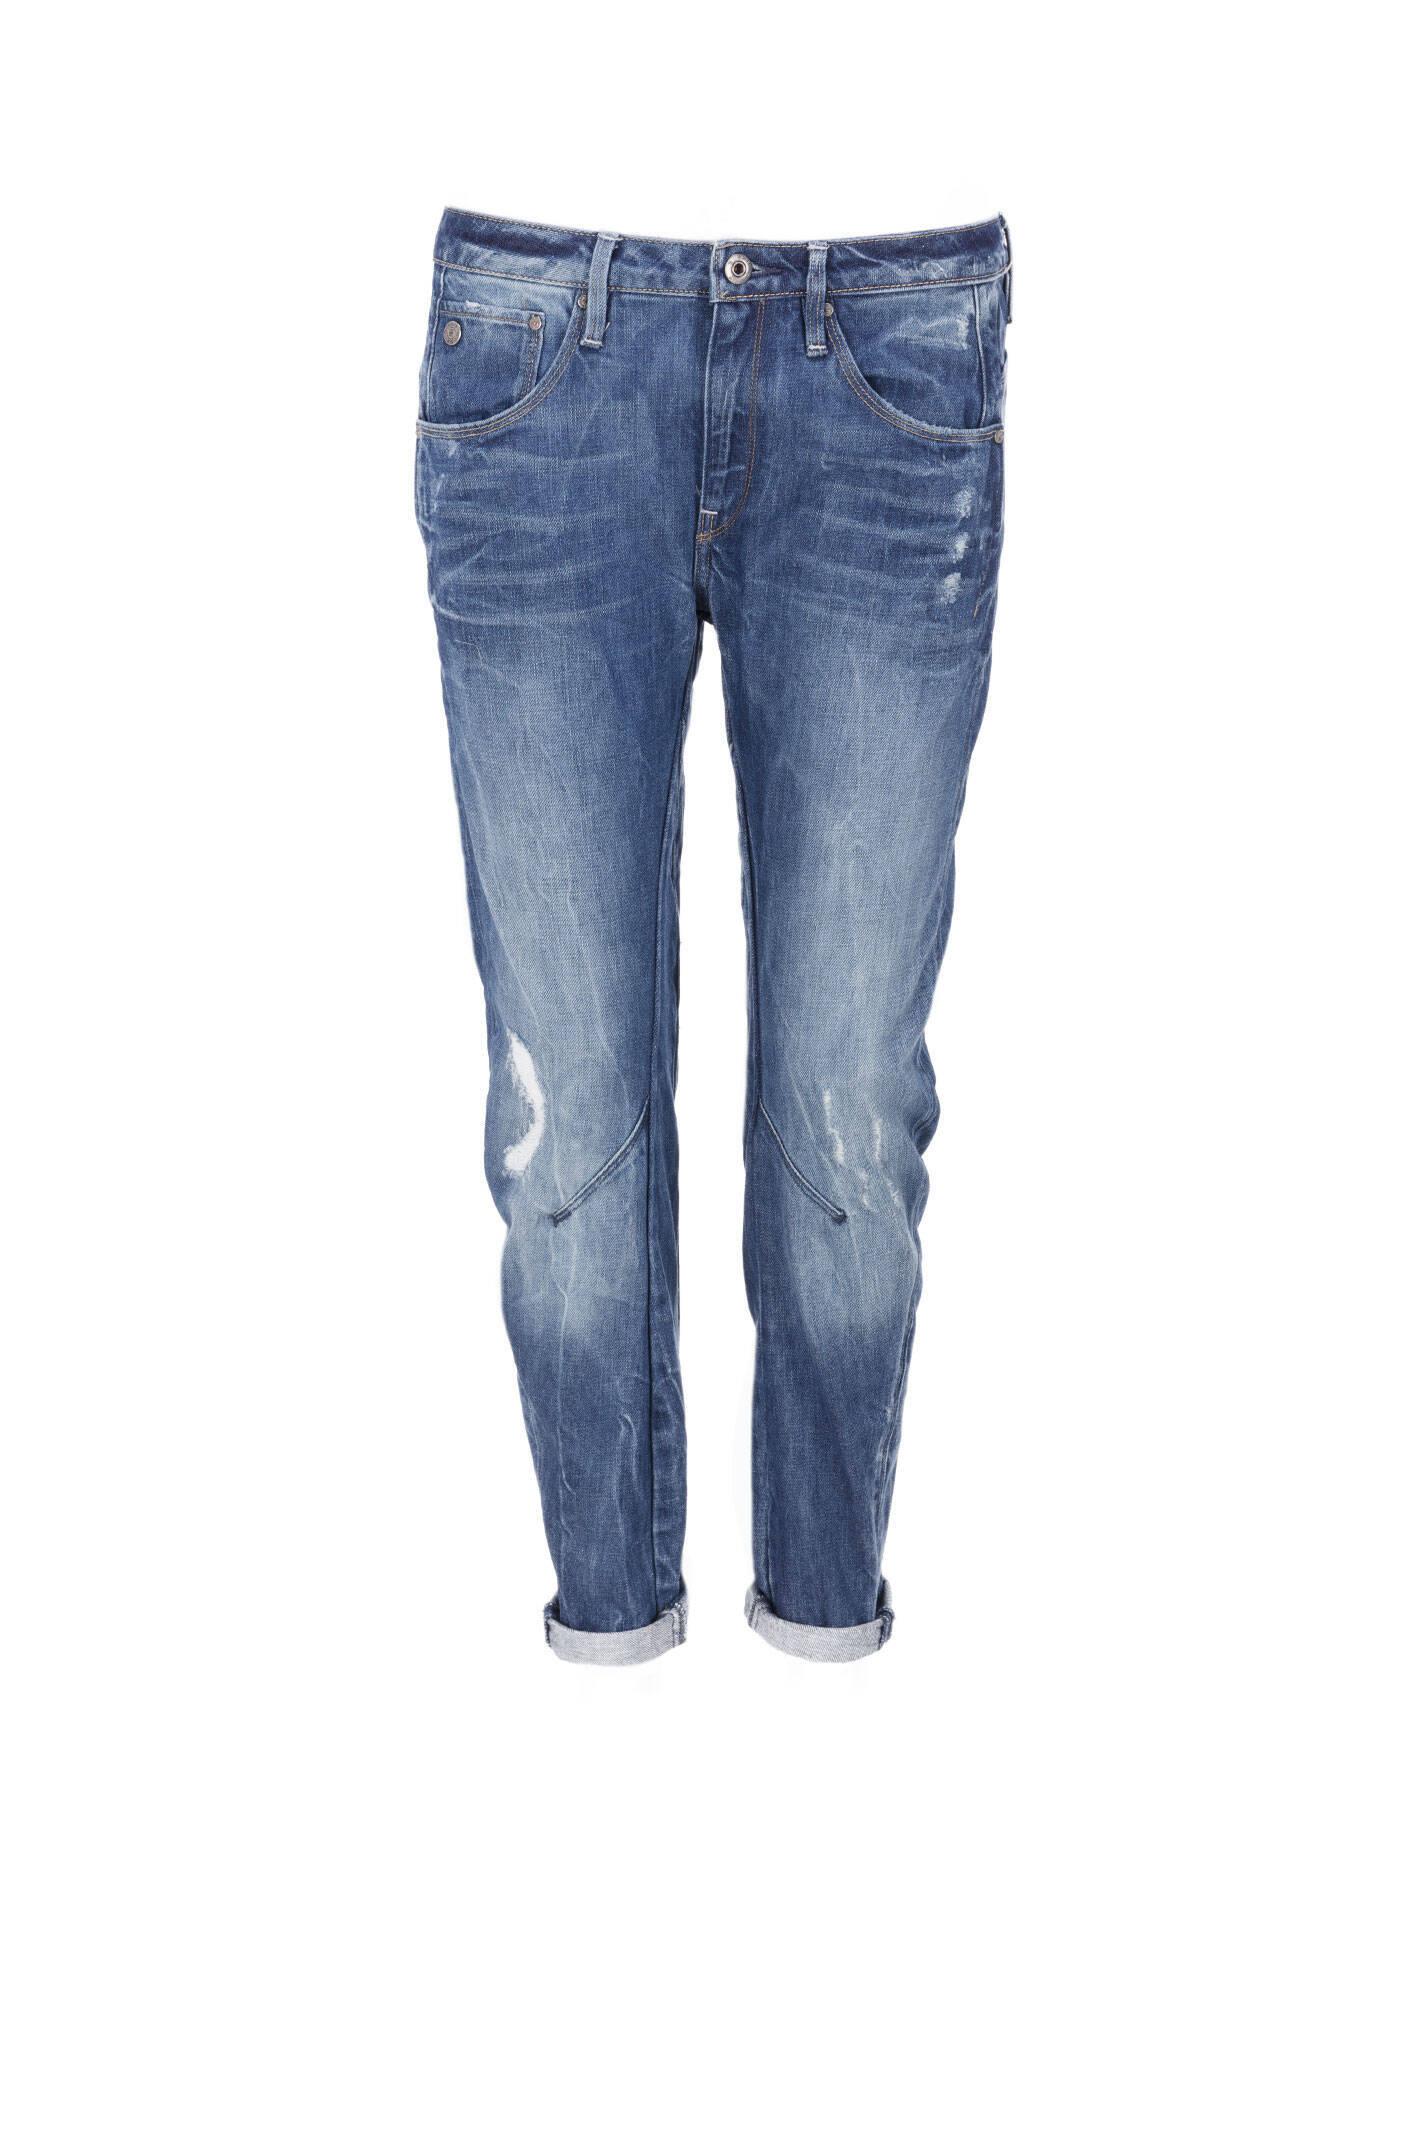 arc 3d low boyfriend jeans g star raw. Black Bedroom Furniture Sets. Home Design Ideas